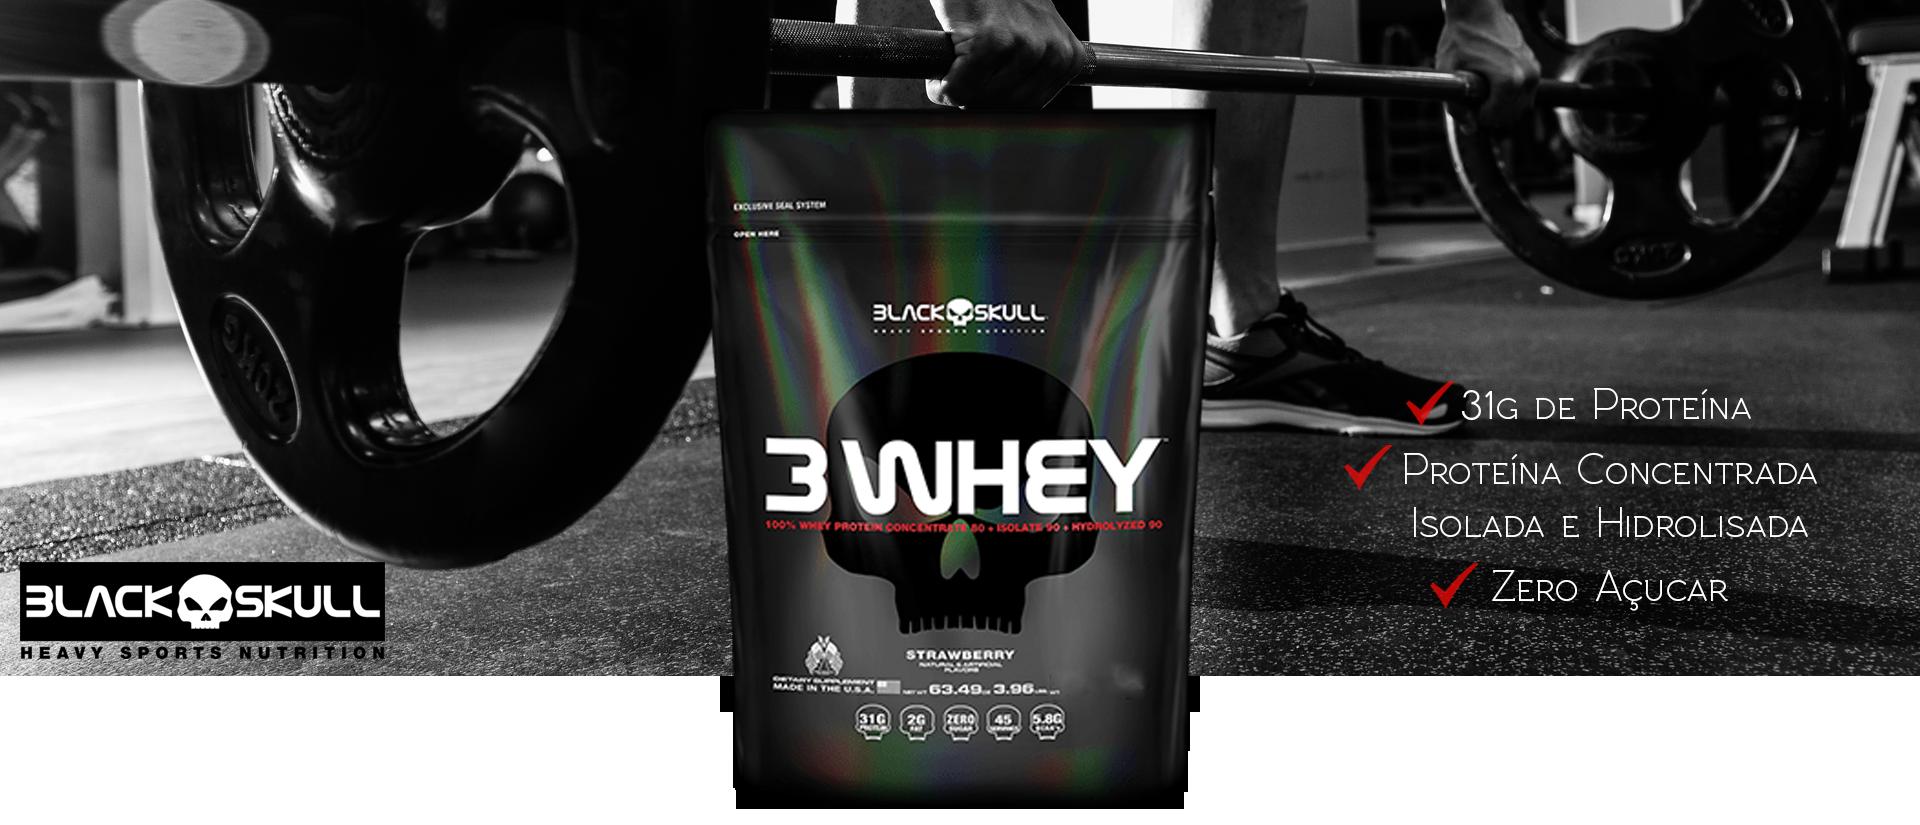 3 Whey Black Skull Banner - Suplemento Whey Protein 3w